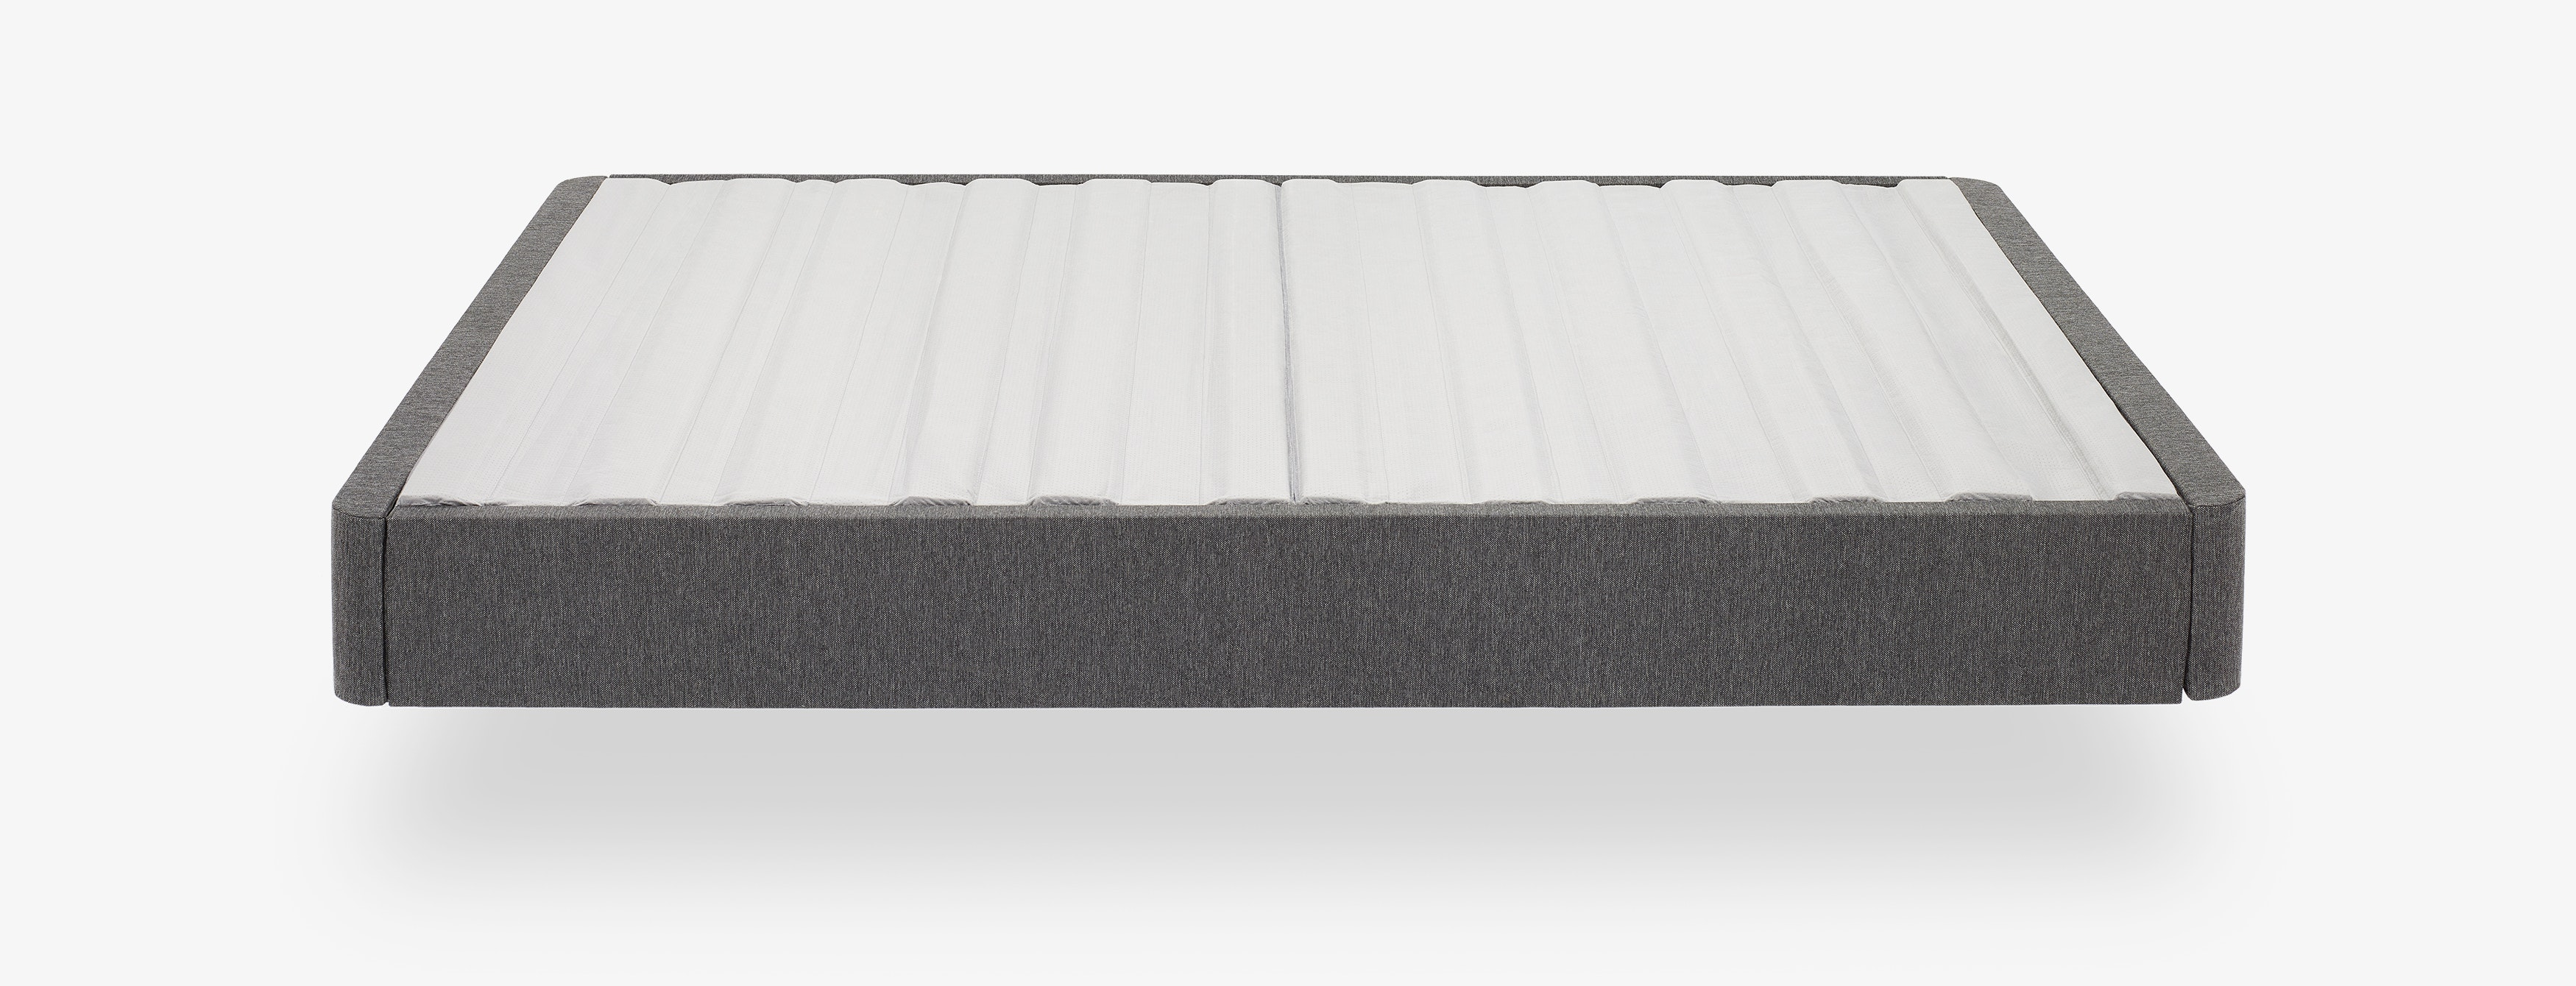 Mattress Foundation Vs Box Spring Serta Perfect Sleeper